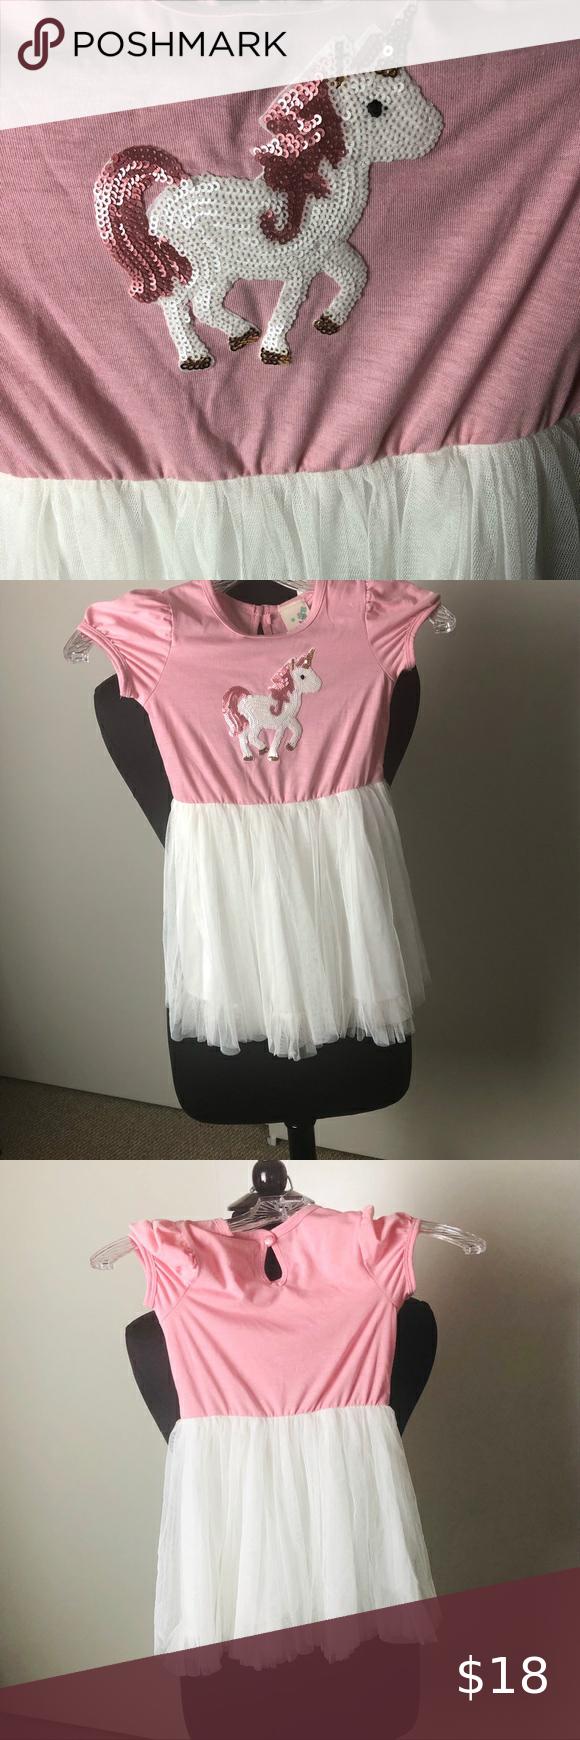 Lily Bleu Unicorn Pony Party Dress Girls Sz 4t Lily Bleu Unicorn Pony Party Dress Girls Sz 4t It Is Pink With White Girls Party Dress Party Dress Girls Dresses [ 1740 x 580 Pixel ]